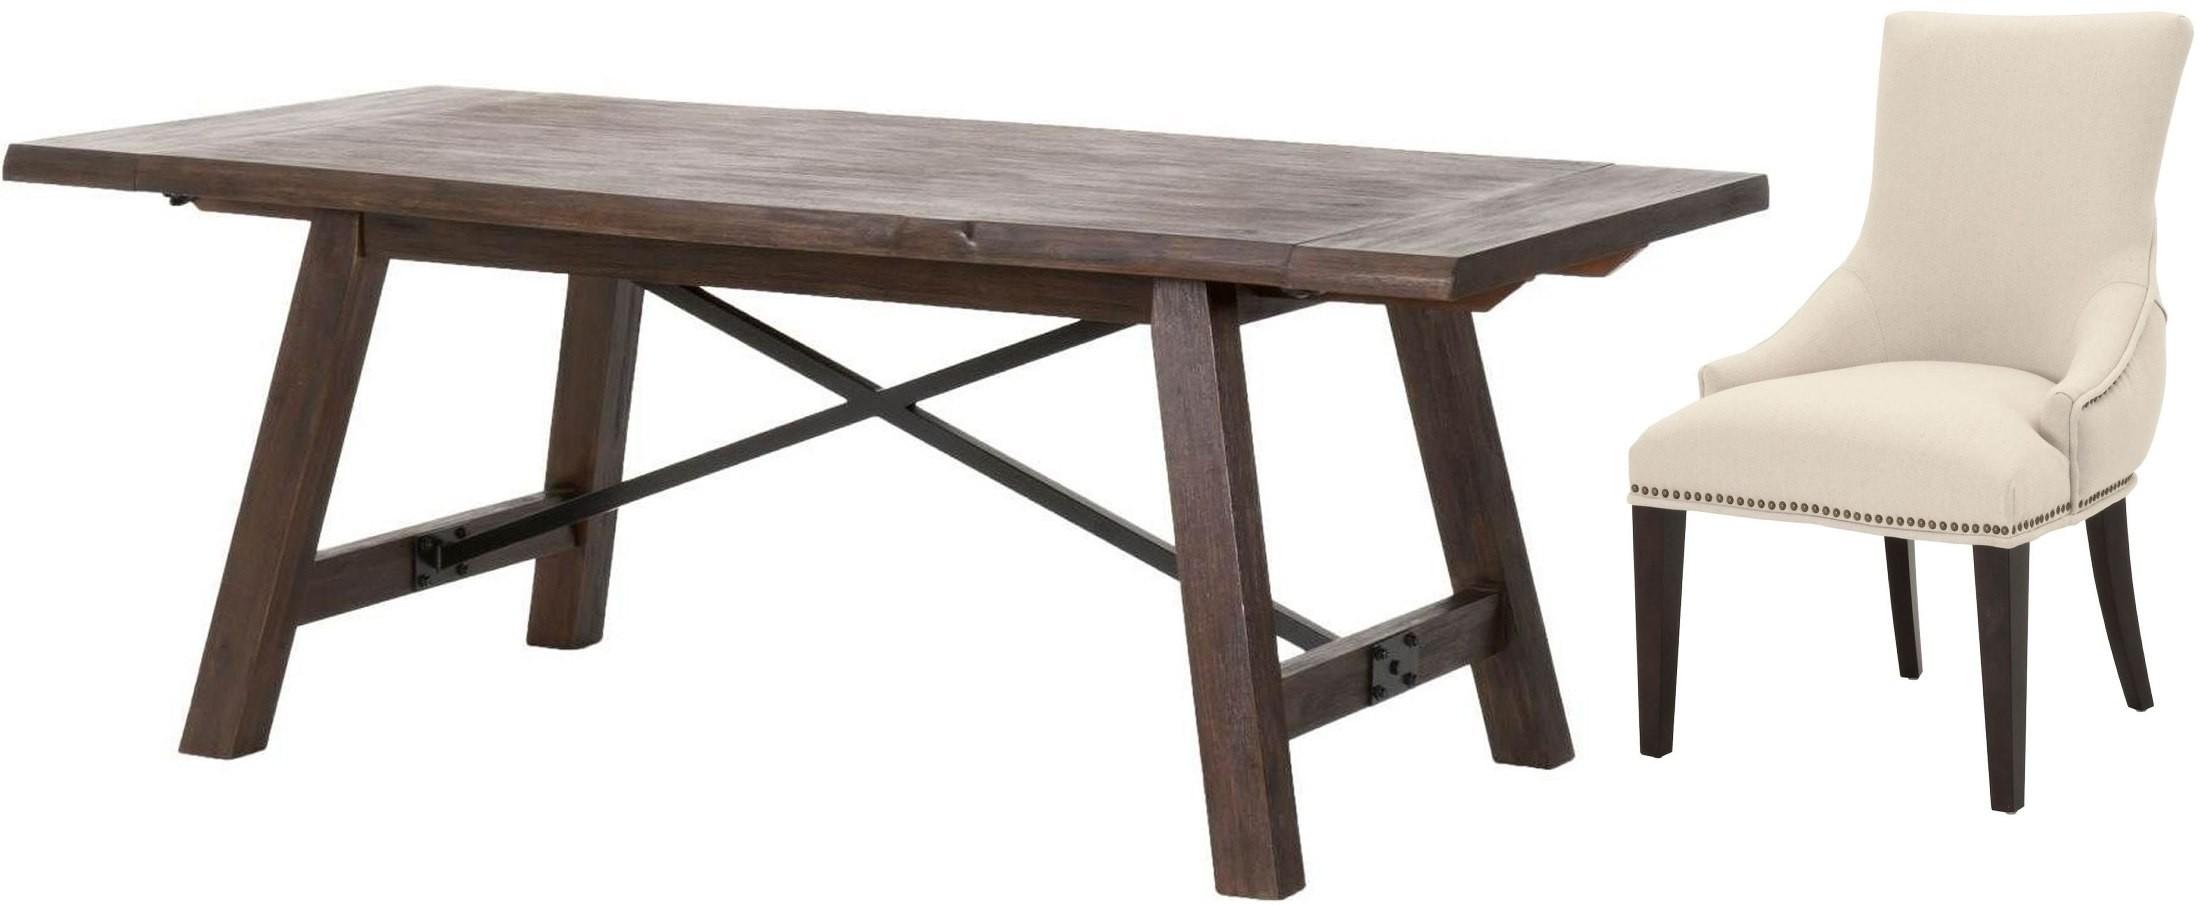 Nixon Rustic Java Extendable Dining Table 6088RJAV  : nixonextensiondiningtable rusticjava setimageorientexpress from colemanfurniture.com size 2200 x 905 jpeg 164kB